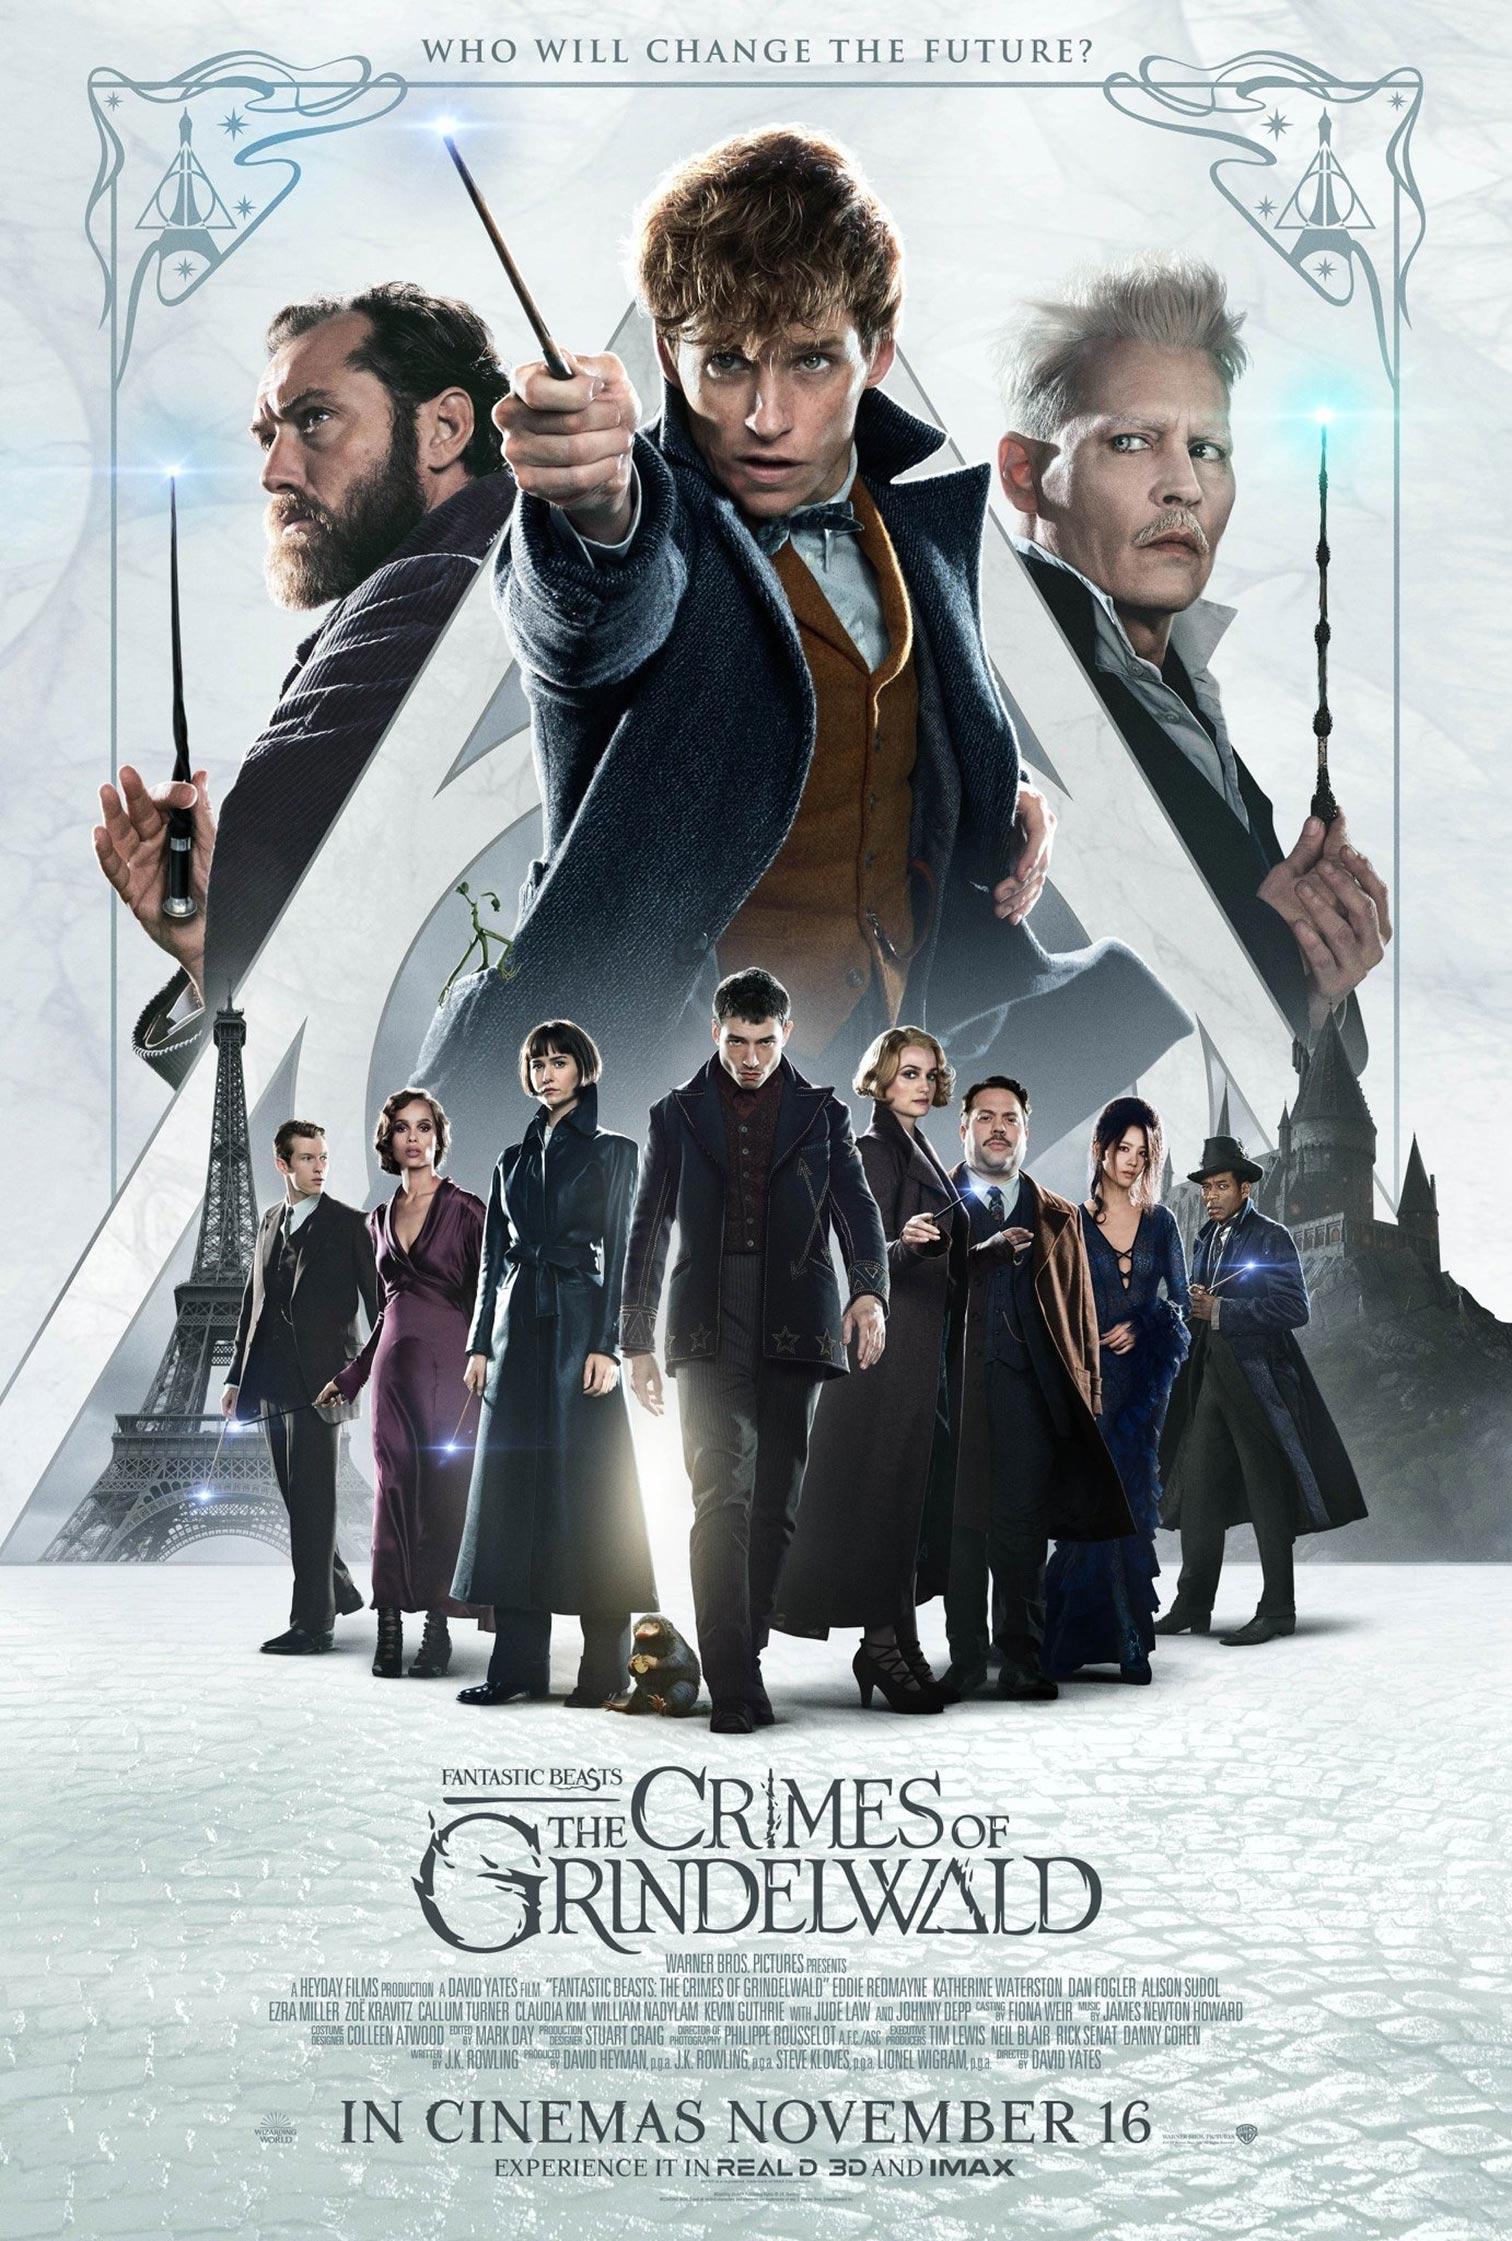 Fantastic Beasts: The Crimes of Grindelwald Poster #20